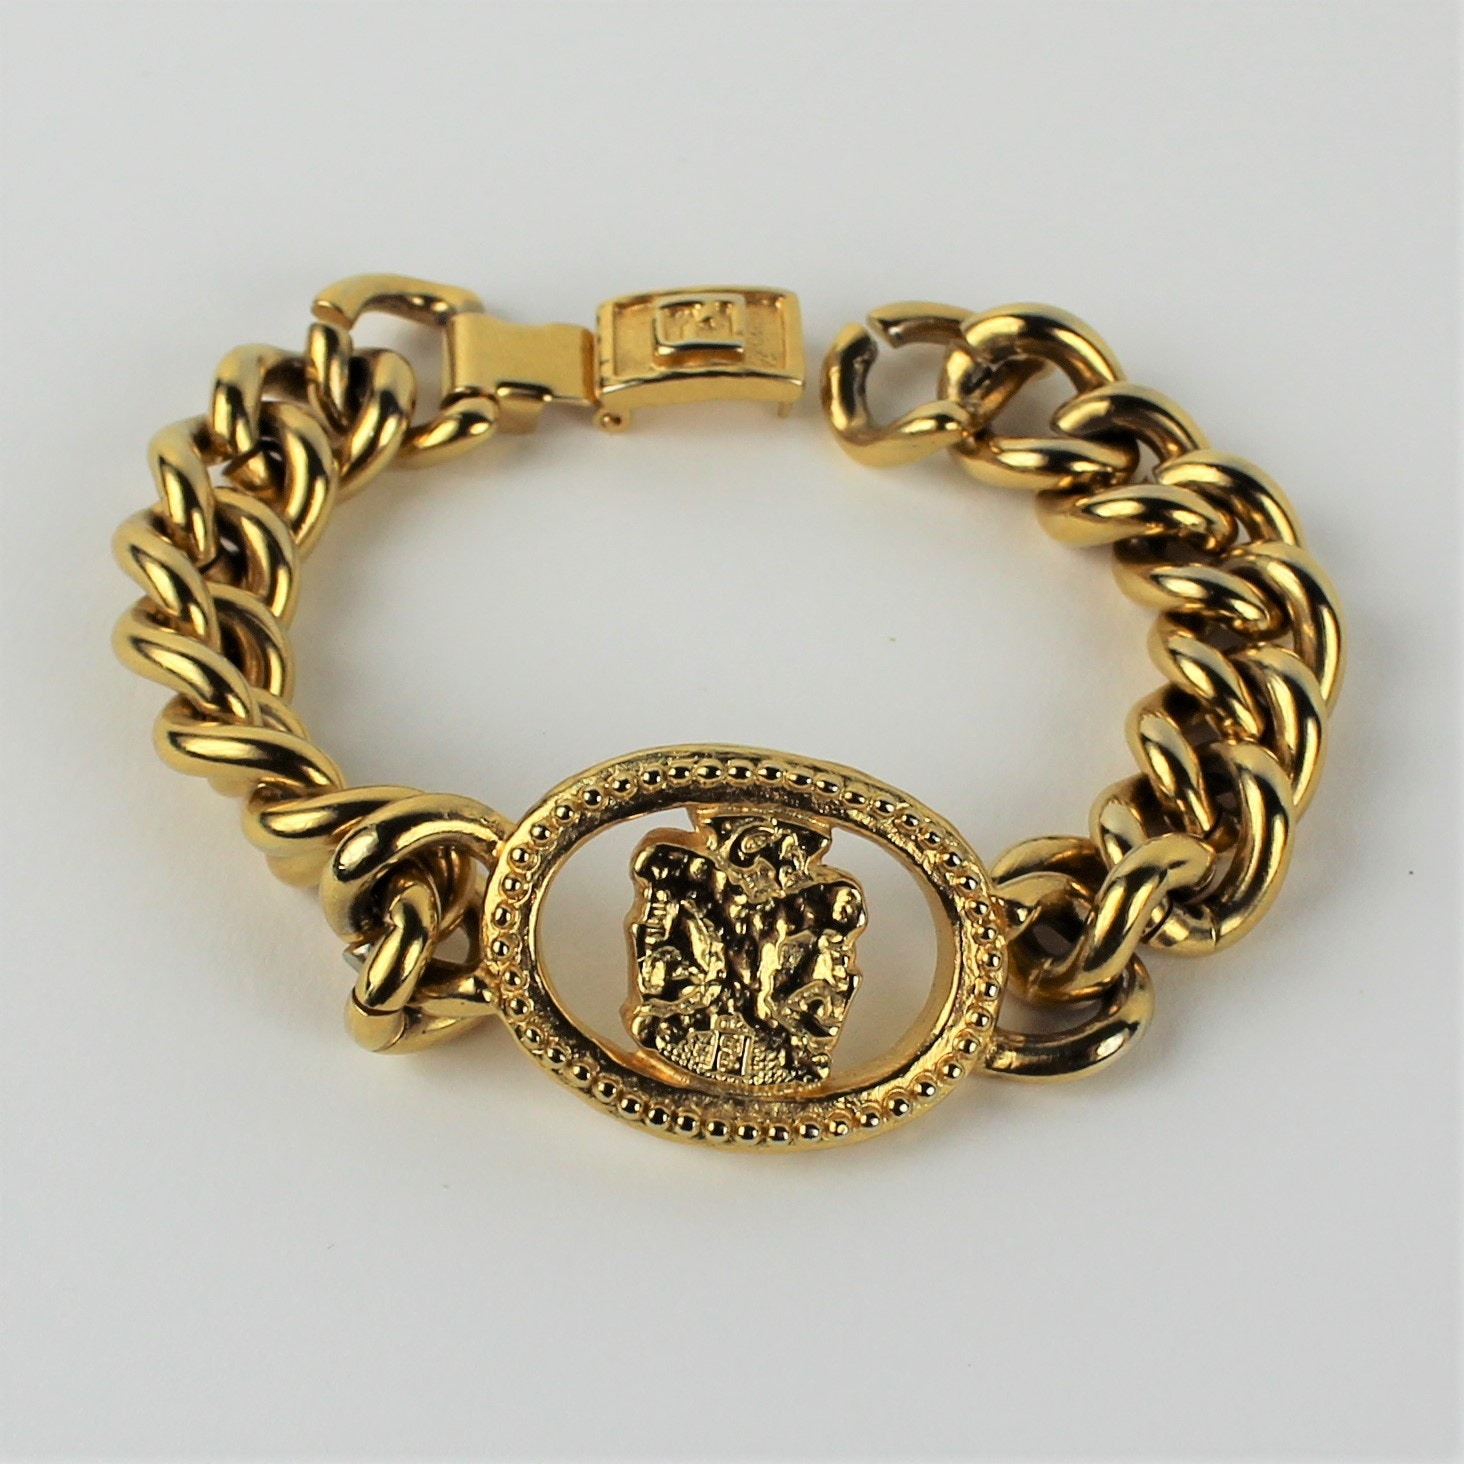 Fendi Curb Link Bracelet